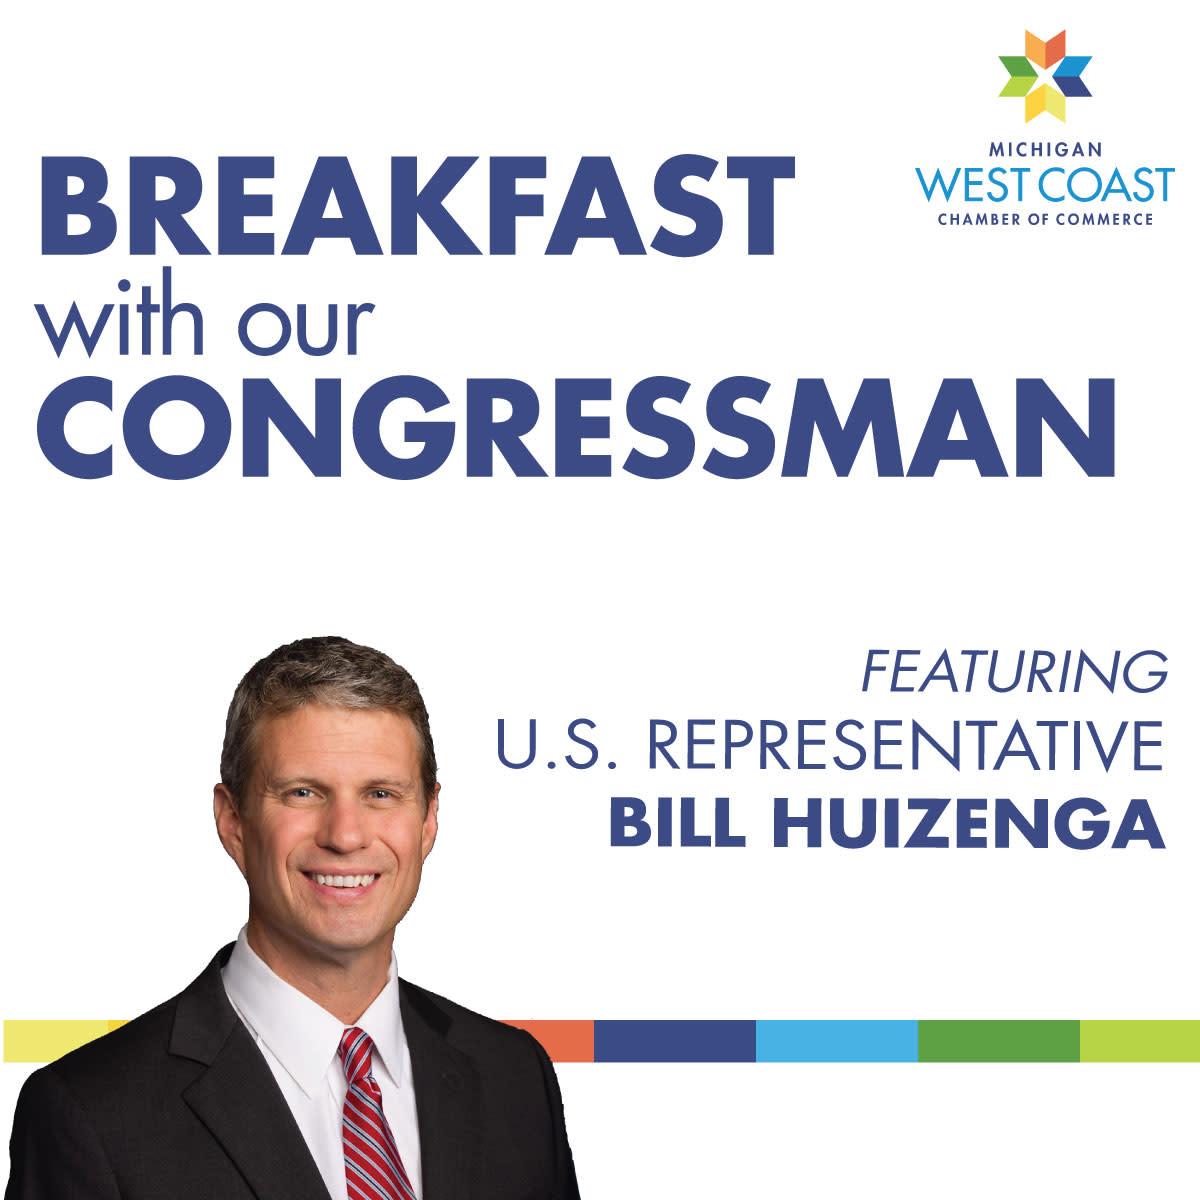 Breakfast with Our Congressman featuring Representative Bill Huizenga